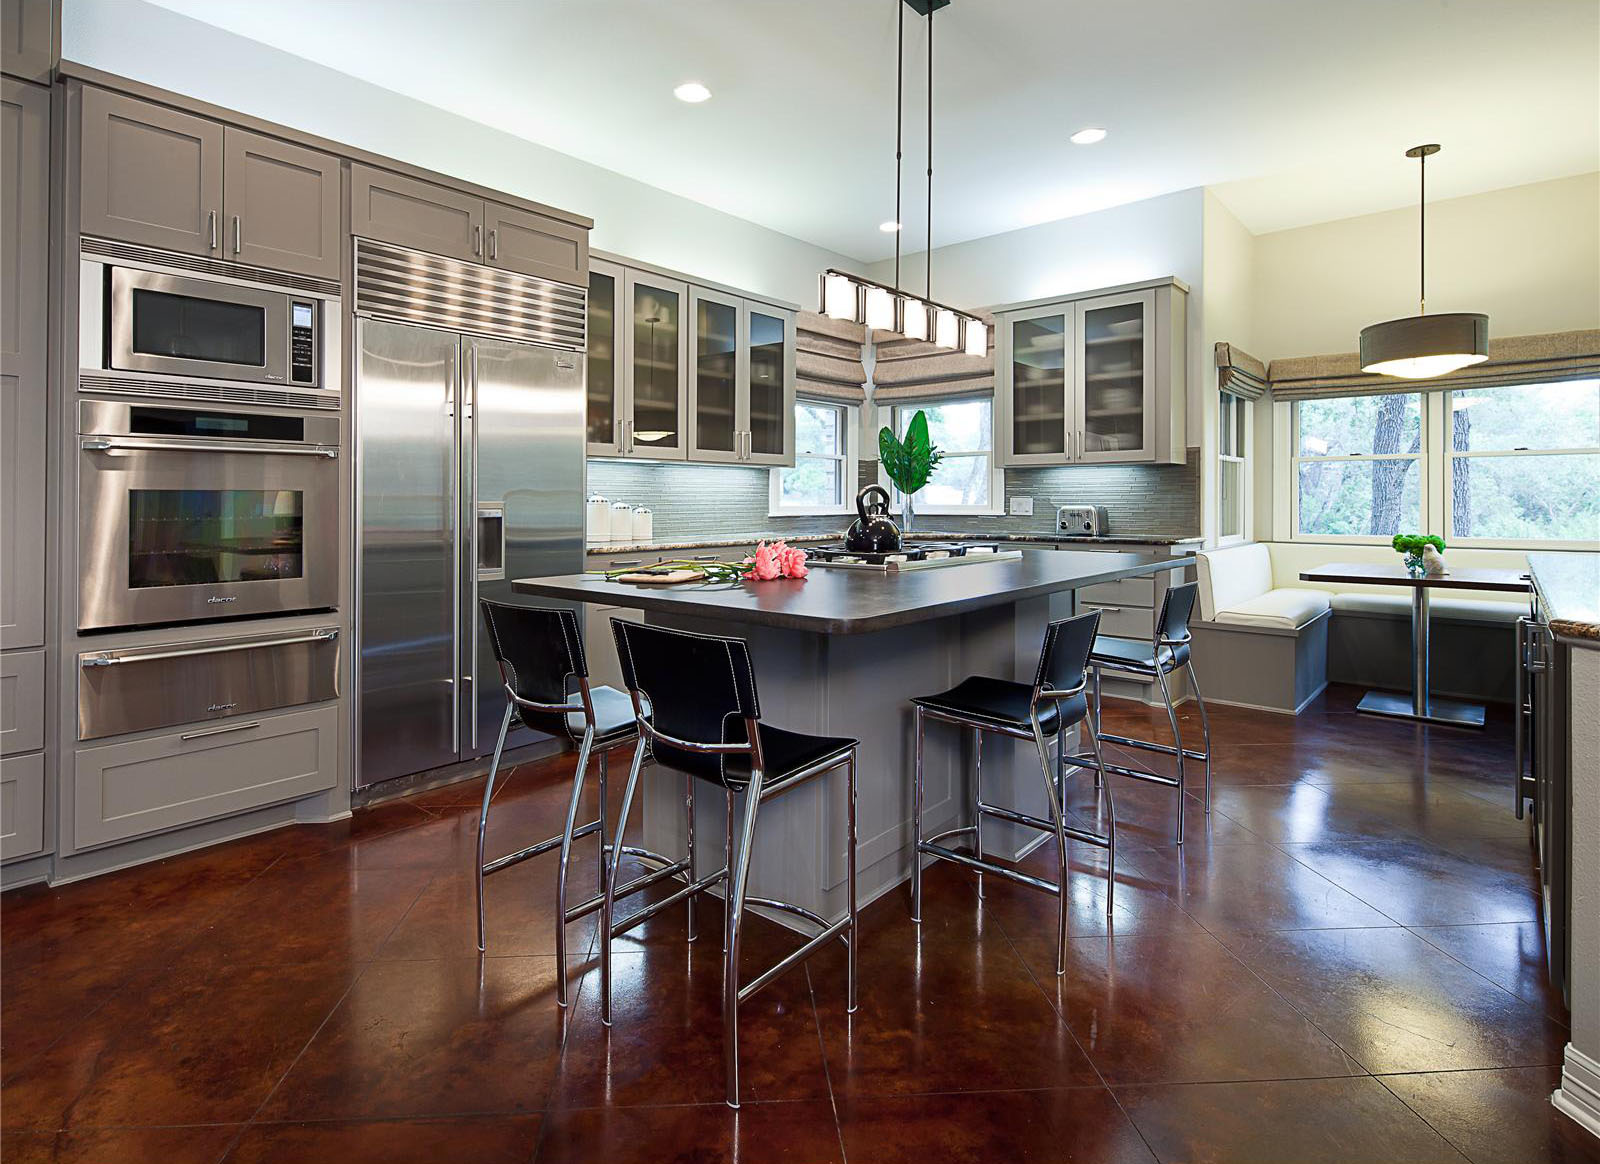 Open Contemporary Kitchen Design Ideas | iDesignArch ... on Modern Kitchen Design Ideas  id=33941